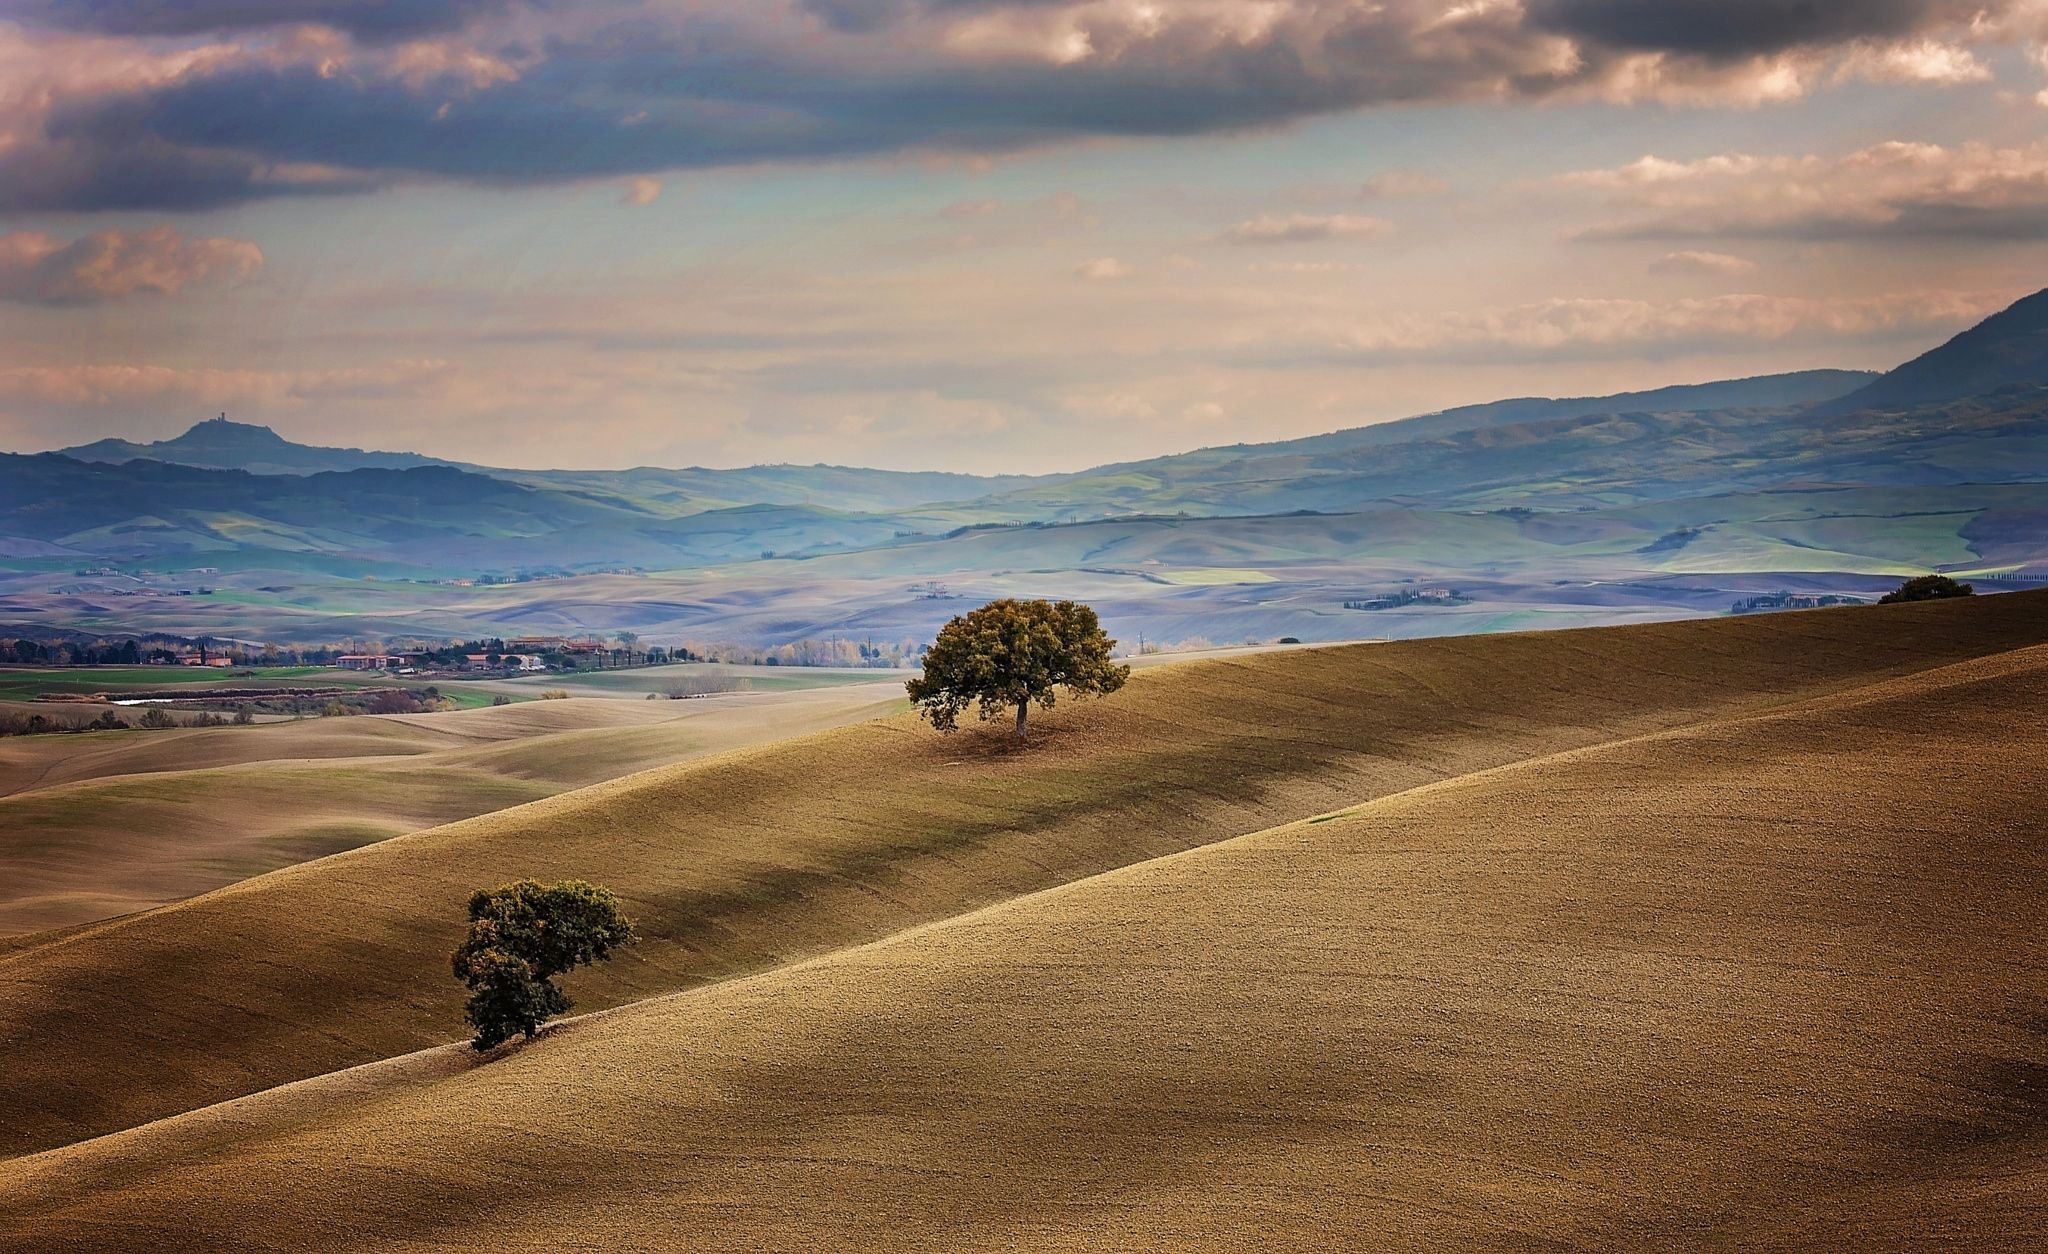 Tuscany - Landscapes  Tuscany